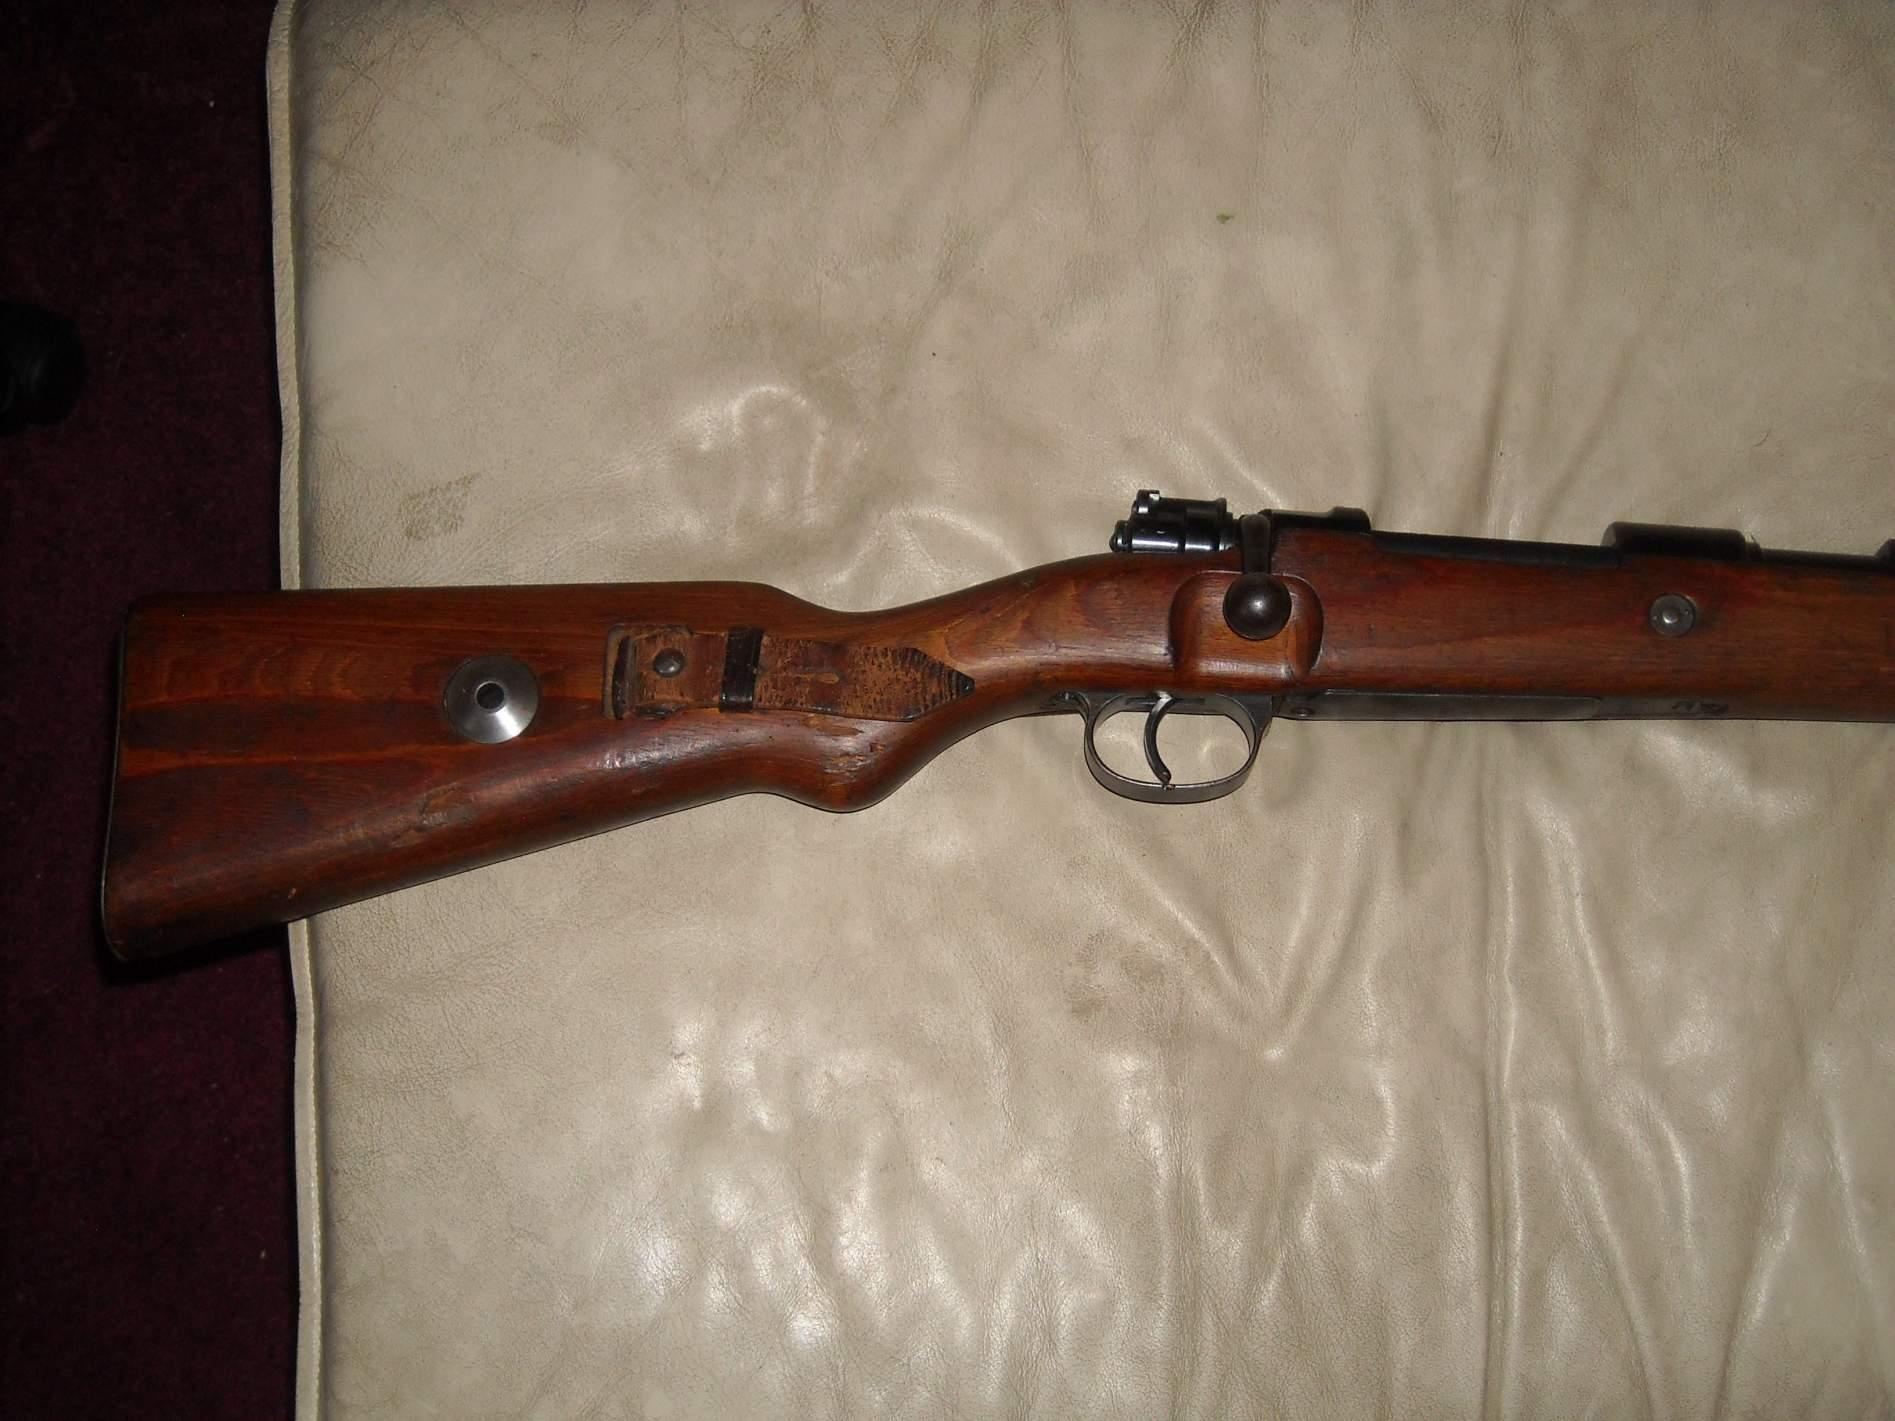 My 1940 243 Code Mauser Borsigwalde Kar 98k